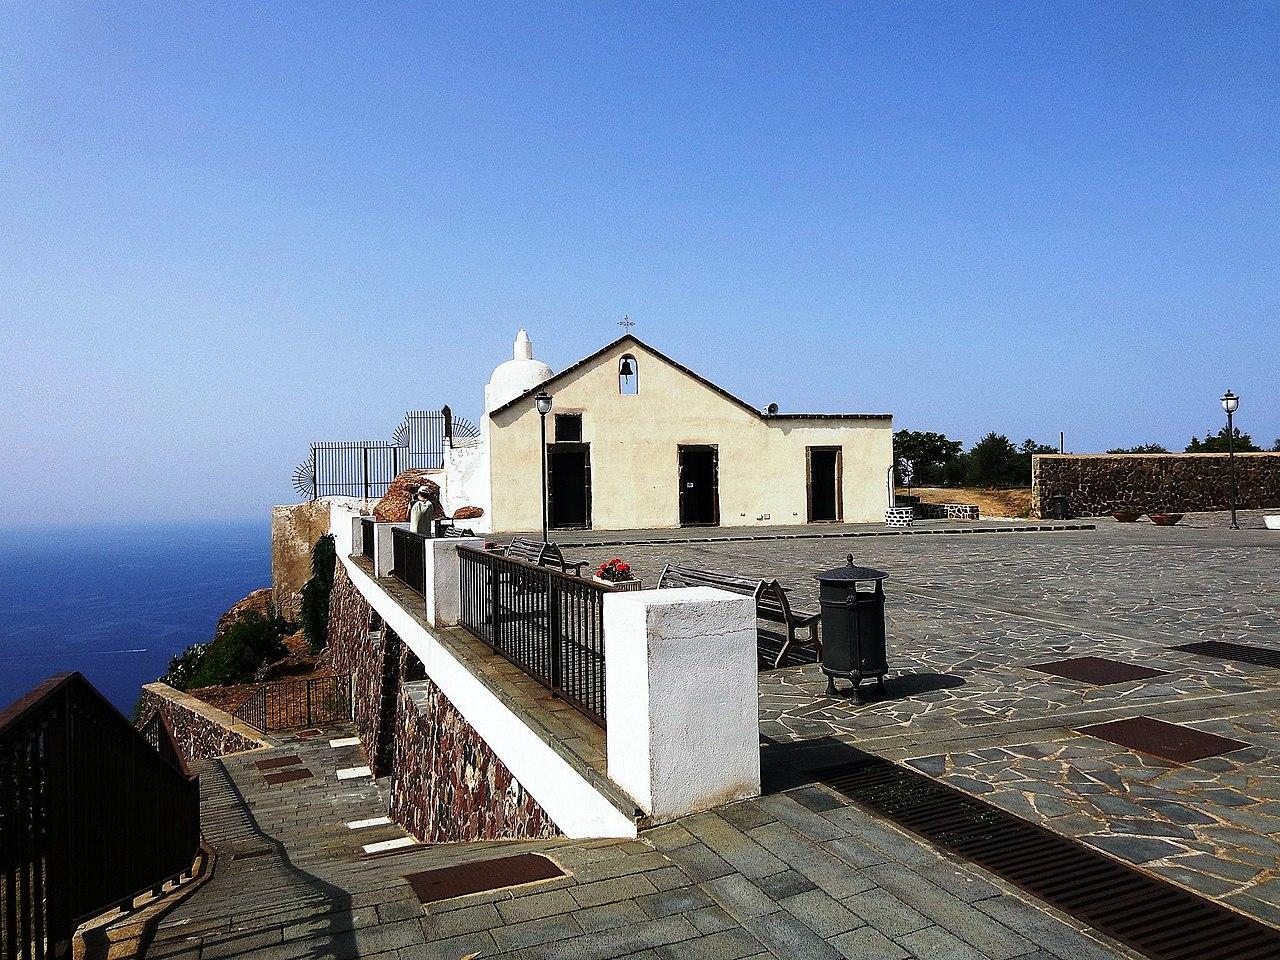 Chiesa Vecchia 10 08 2012 03.jpg